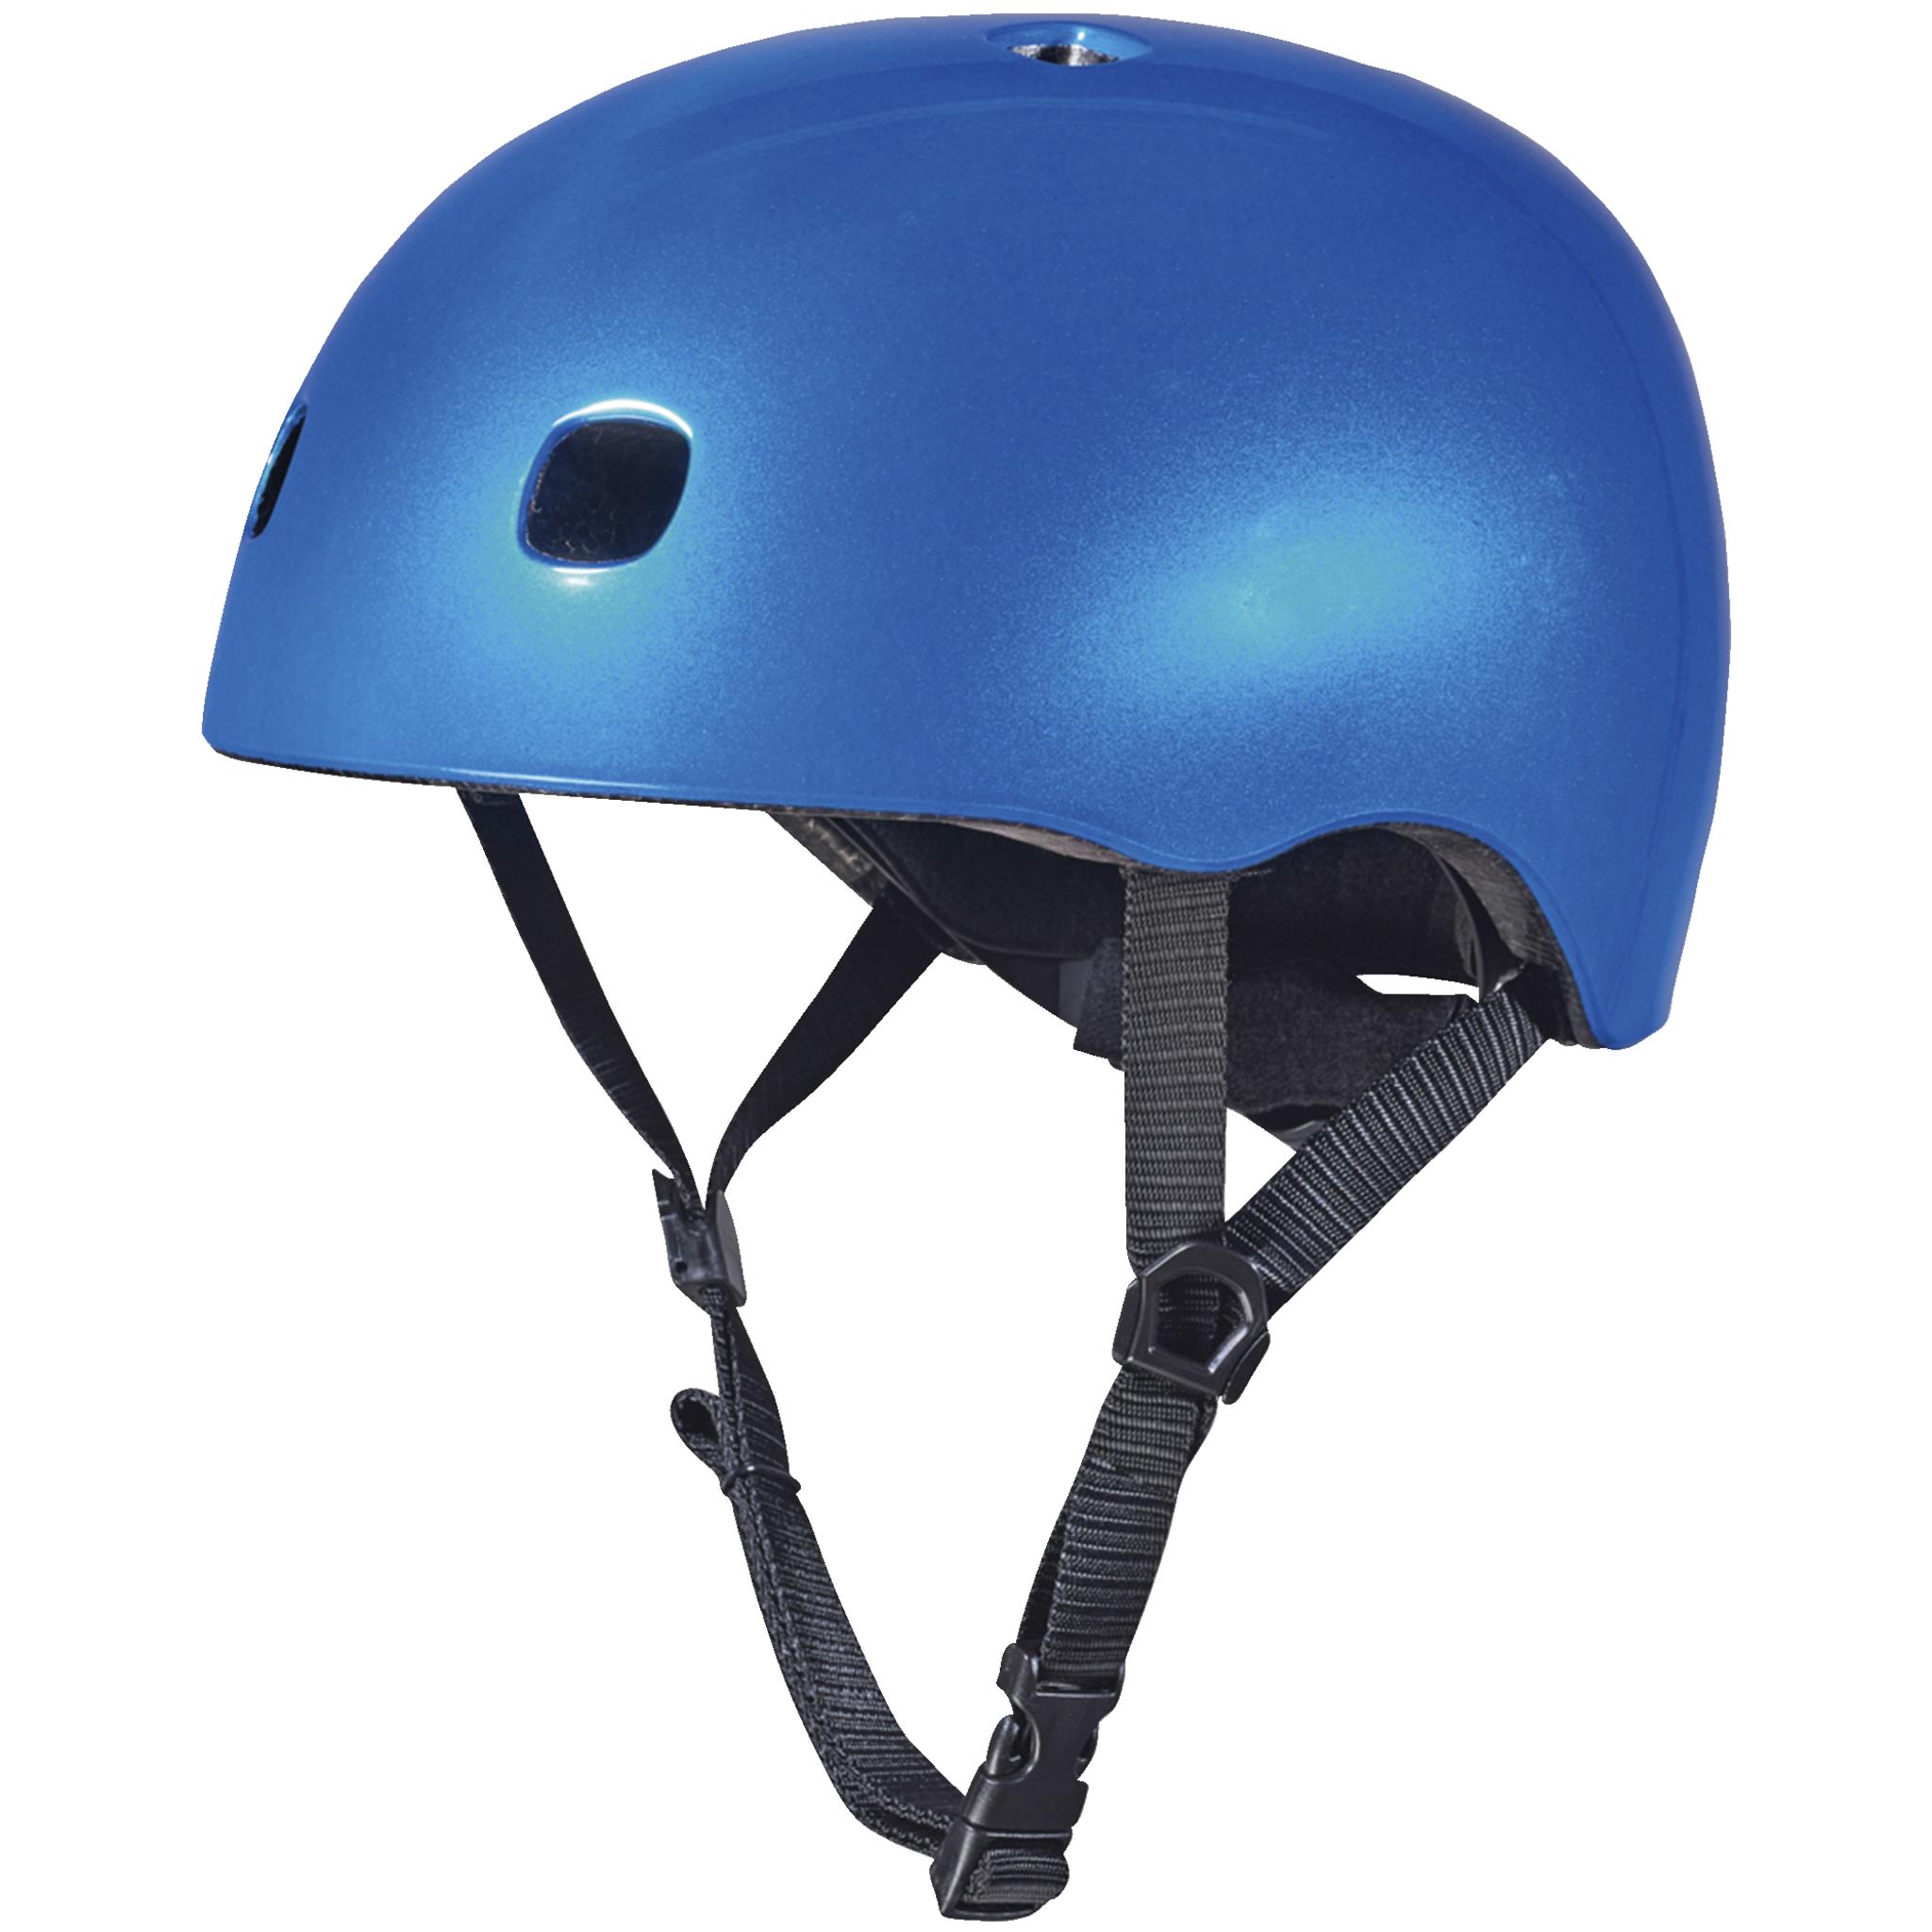 Micro helmet, sparkesykkelhjelm barn/ungdom